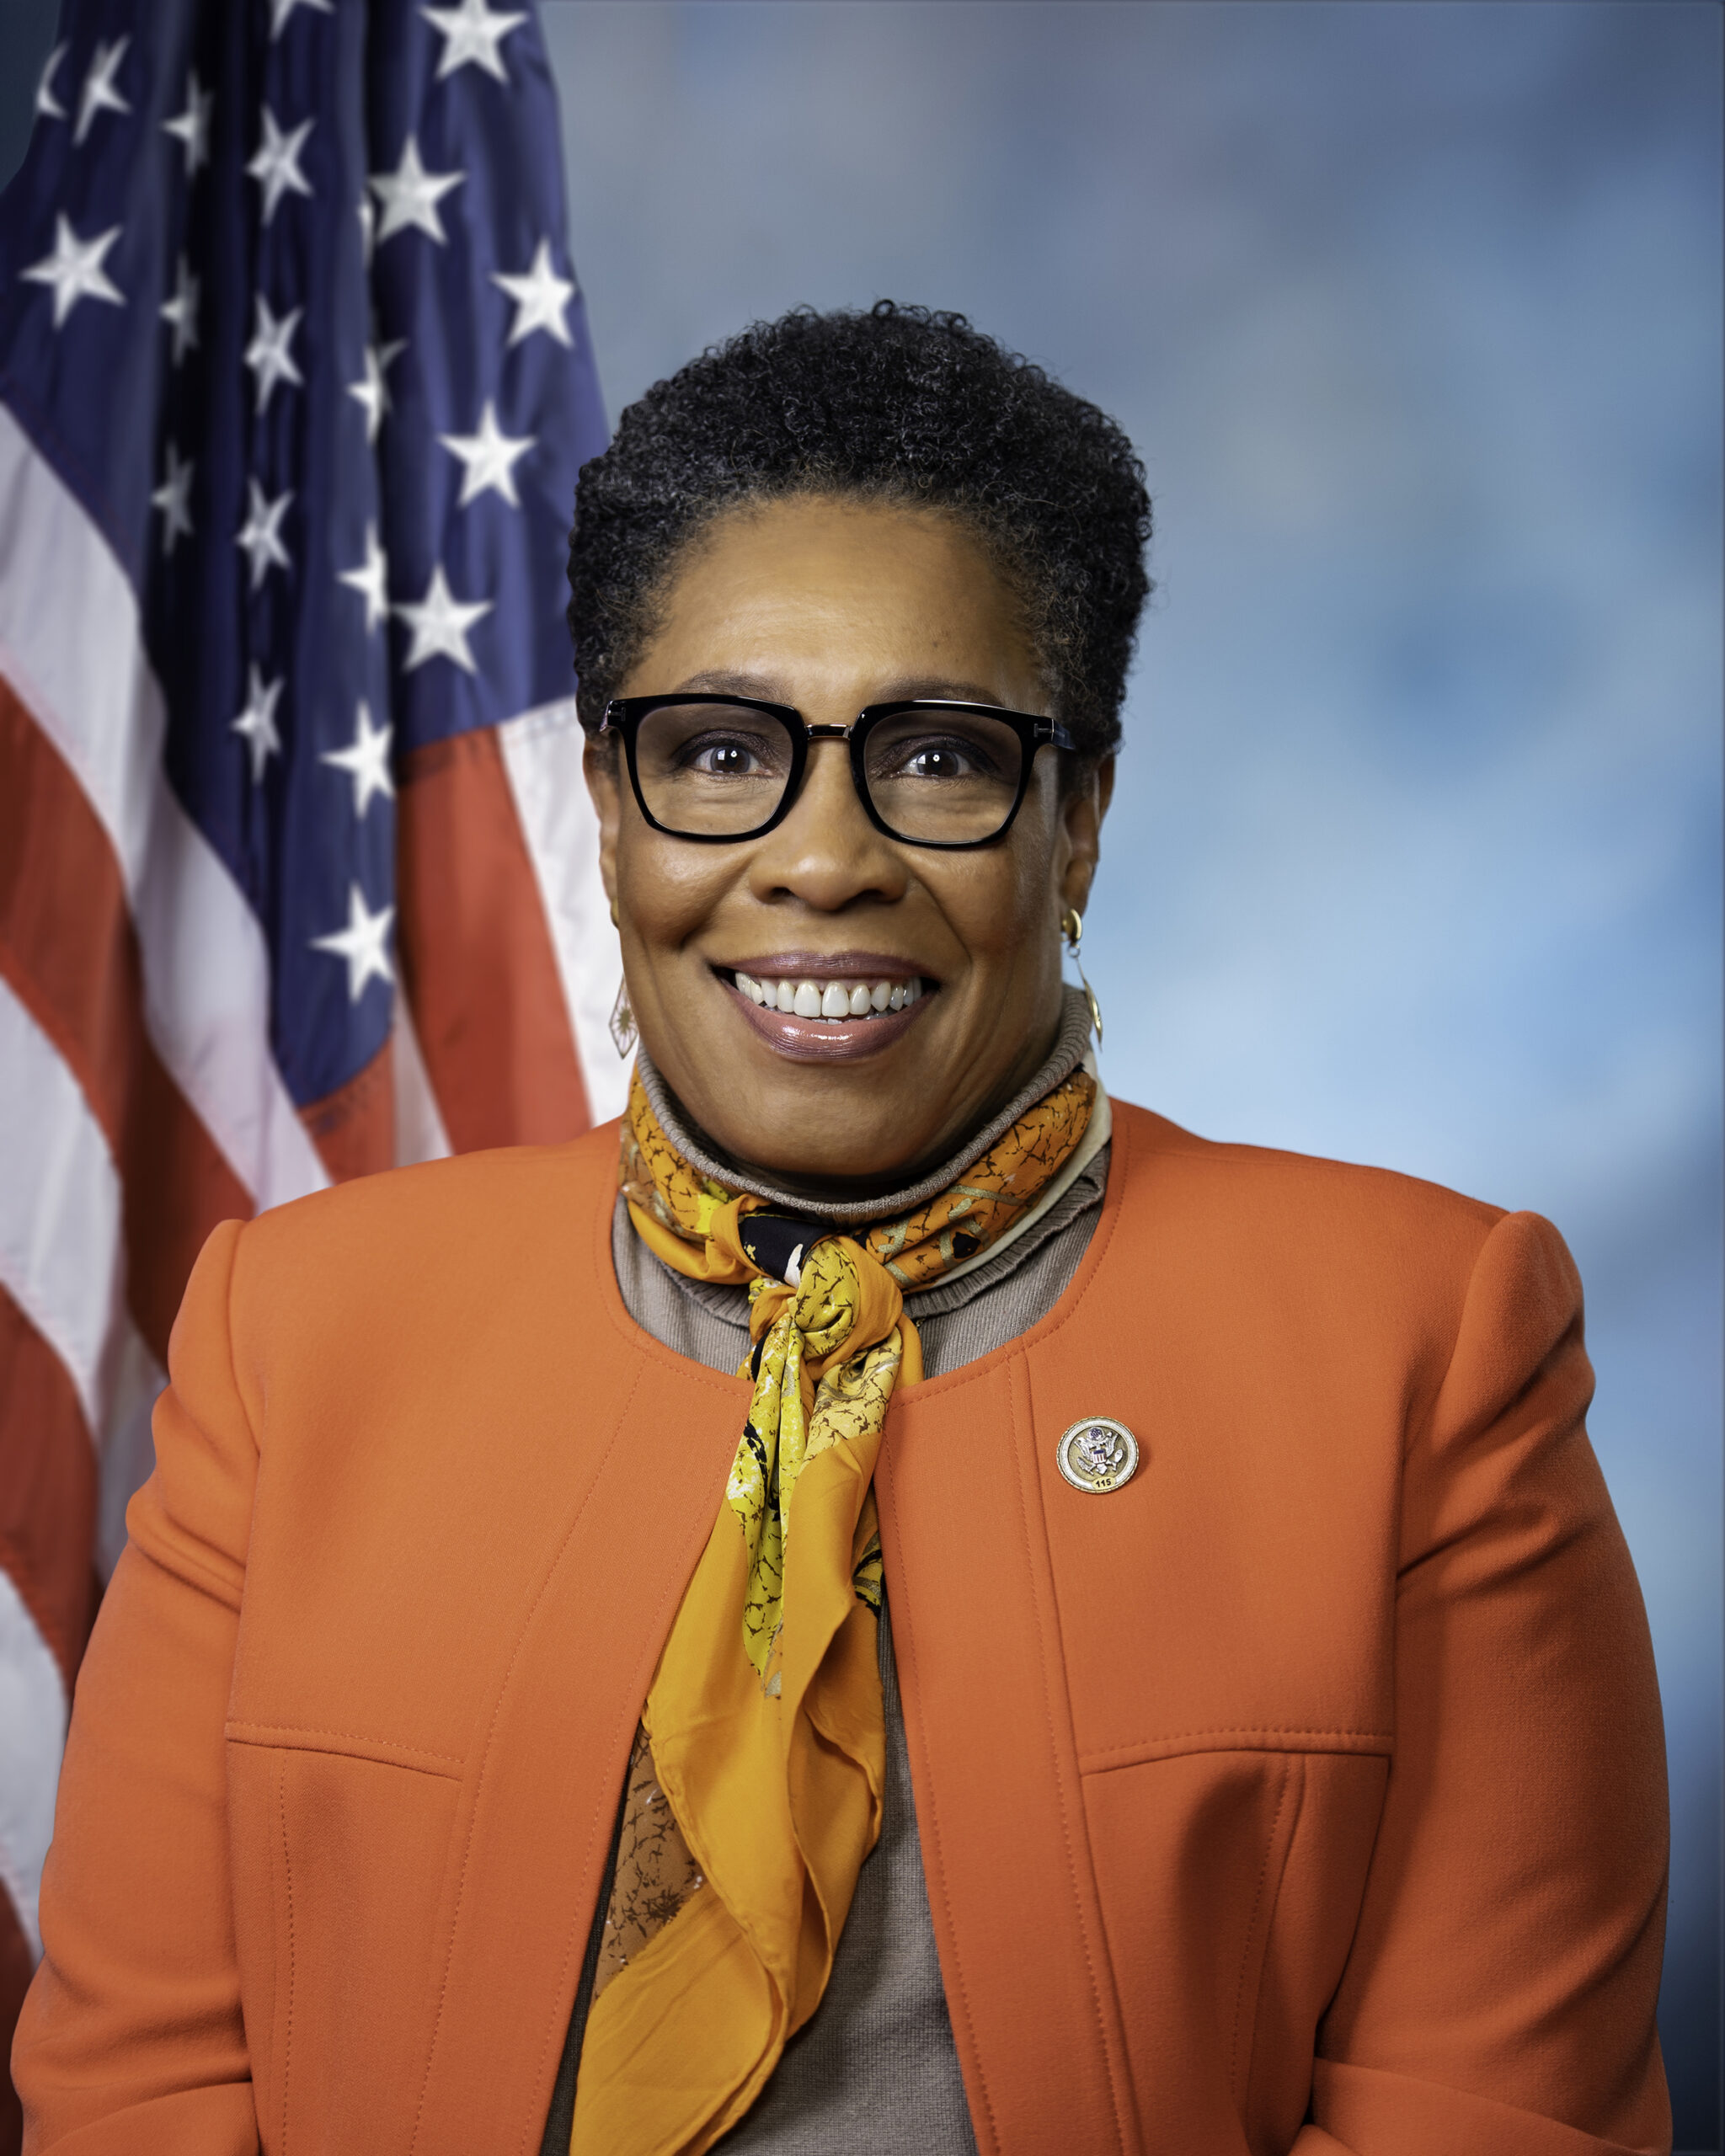 Greetings from HUD Secretary Marcia L. Fudge!